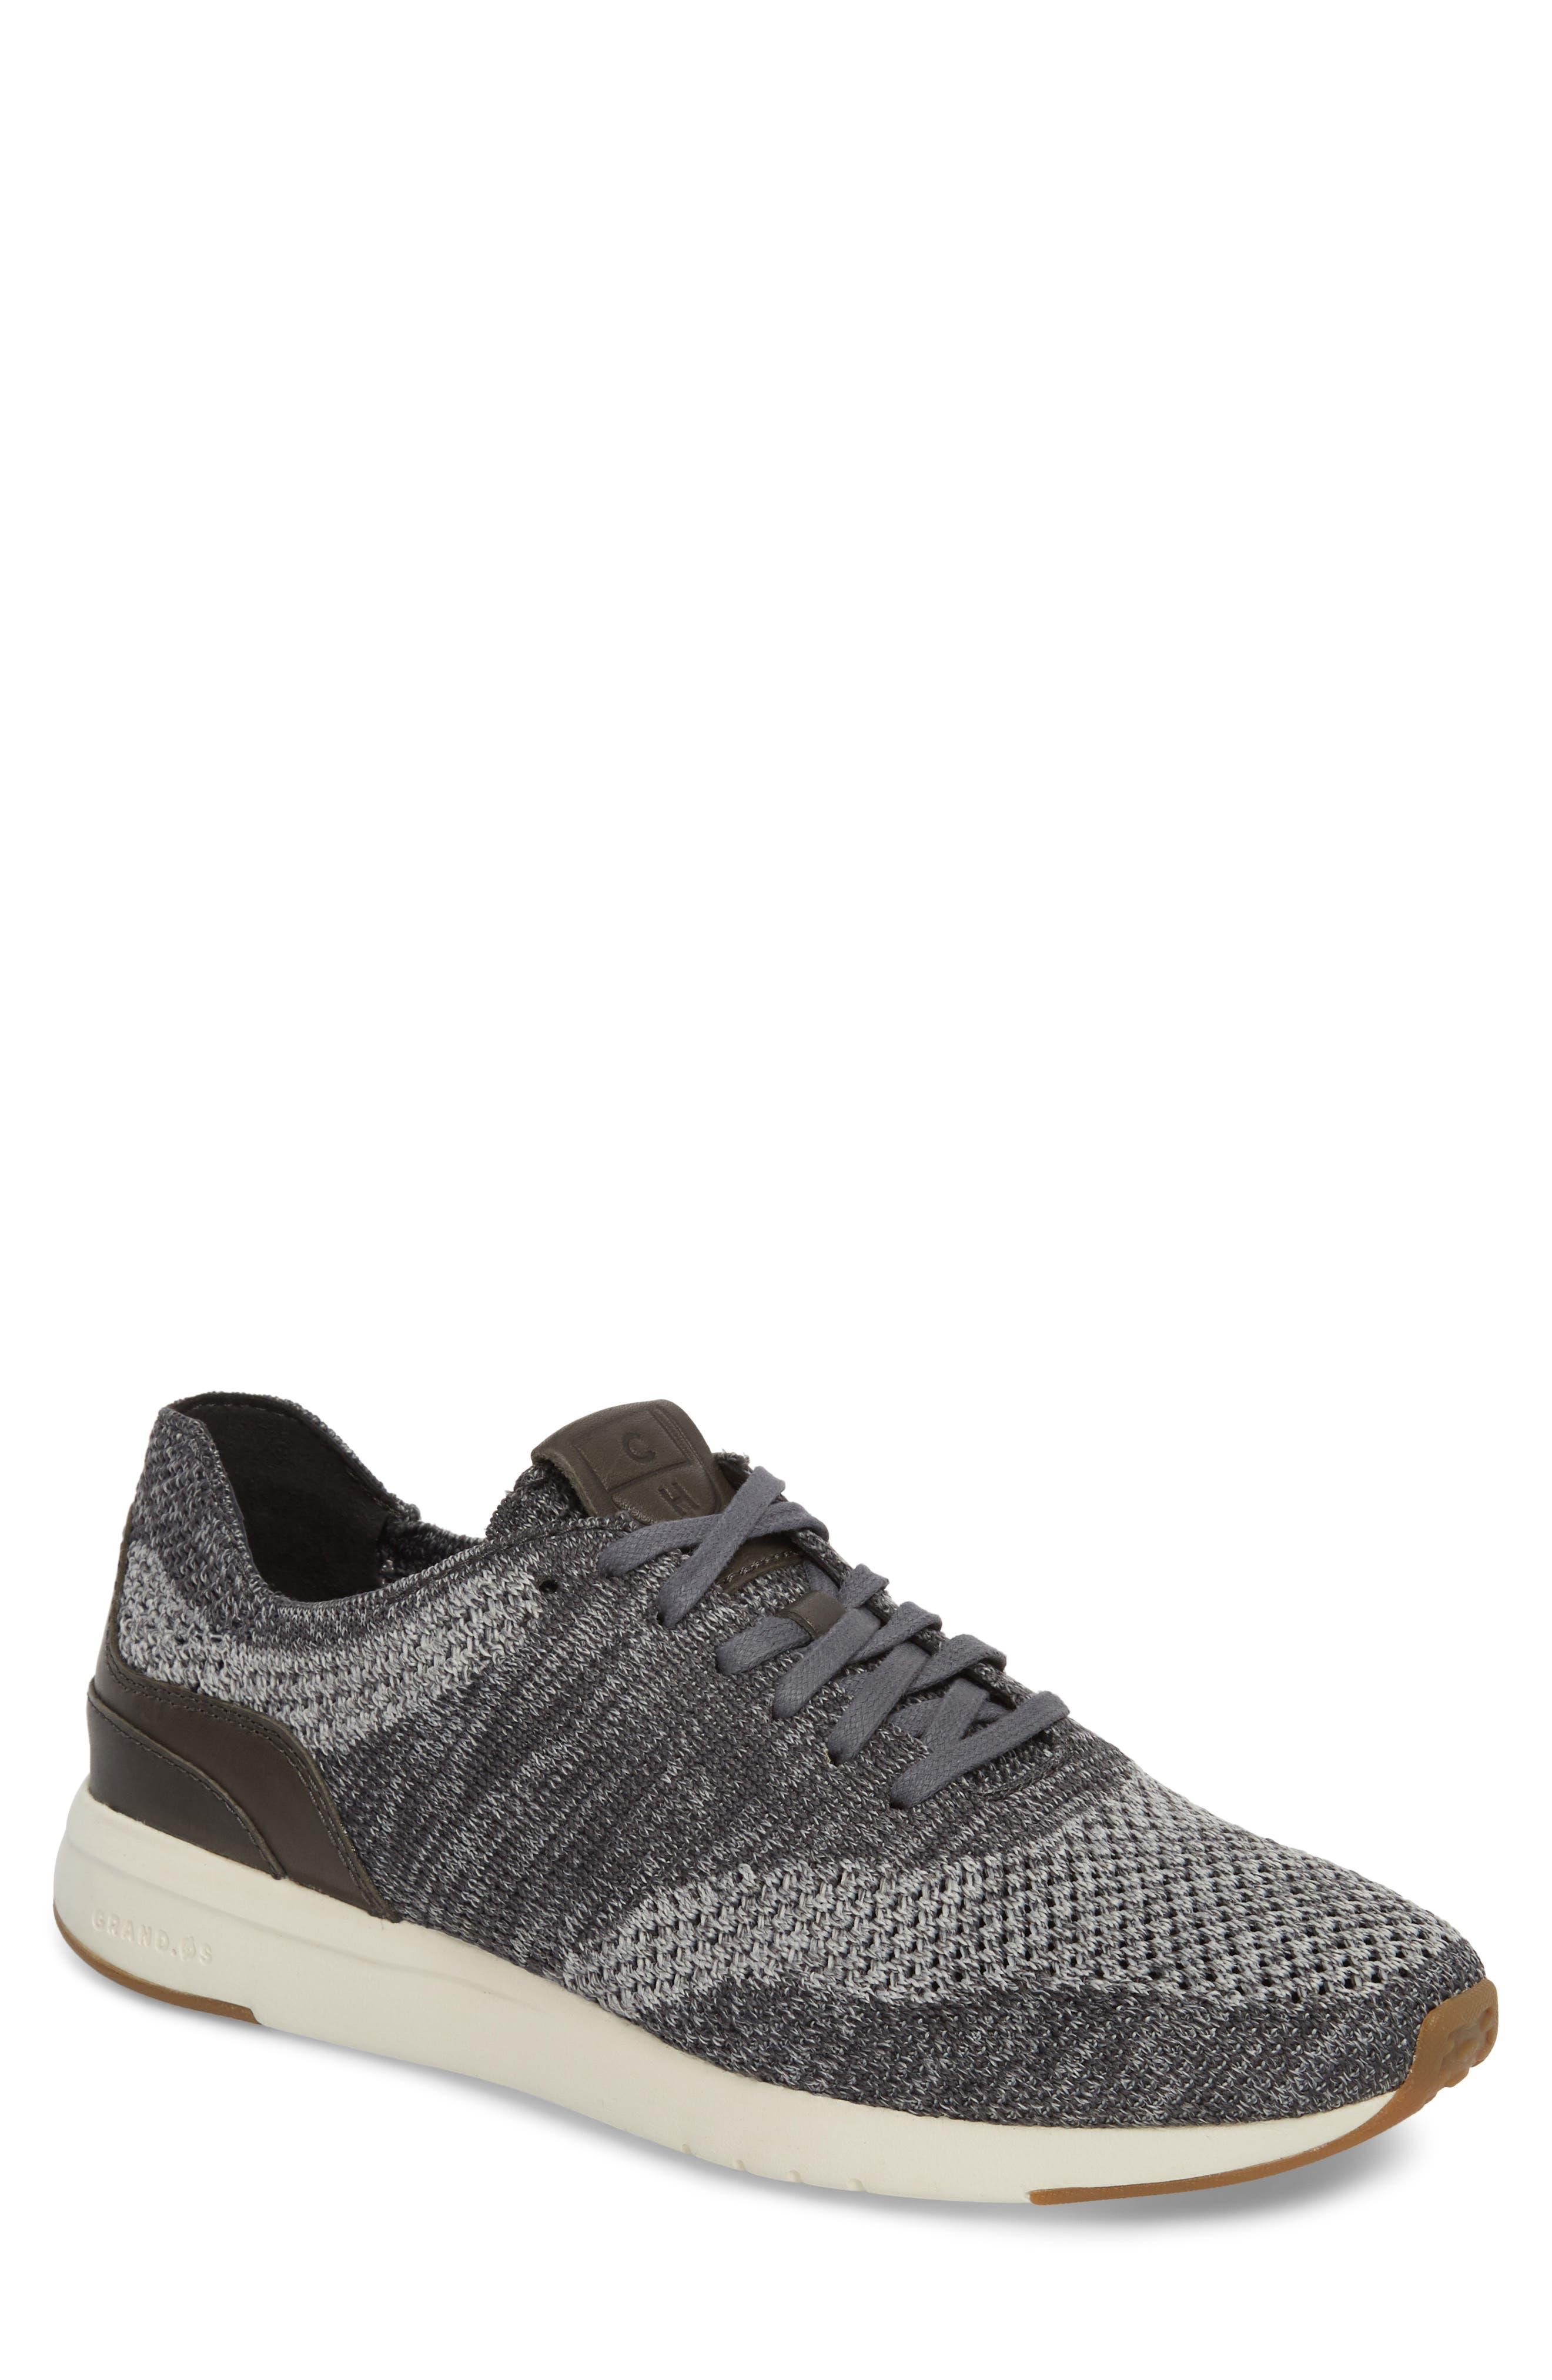 Cole Haan Grandpro Runner Stitchlite Sneaker- Grey